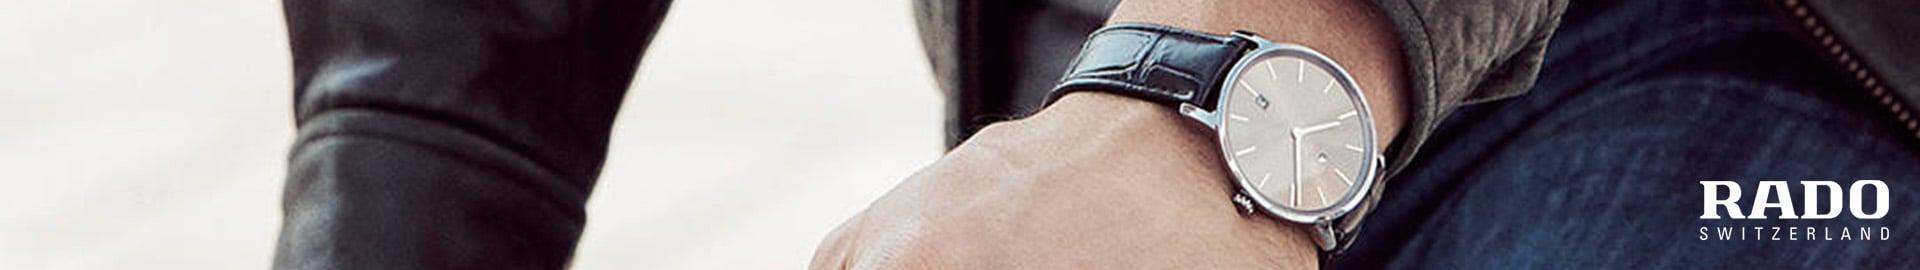 RADO men's watches Zazare Diamonds